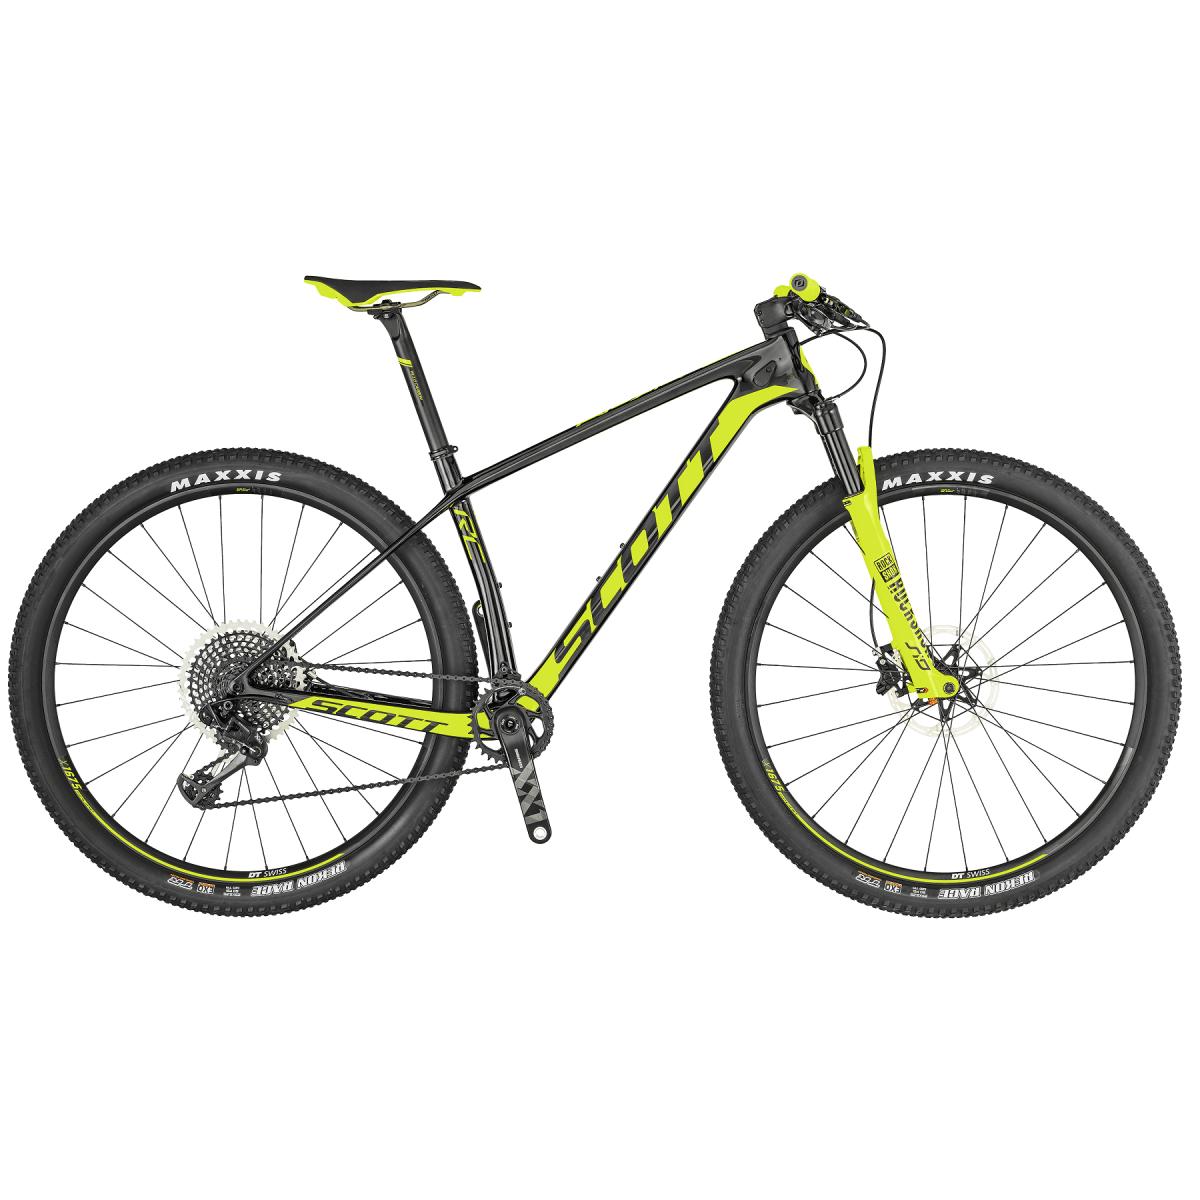 Scott Sale Rc 900 Wc Mountain Bike